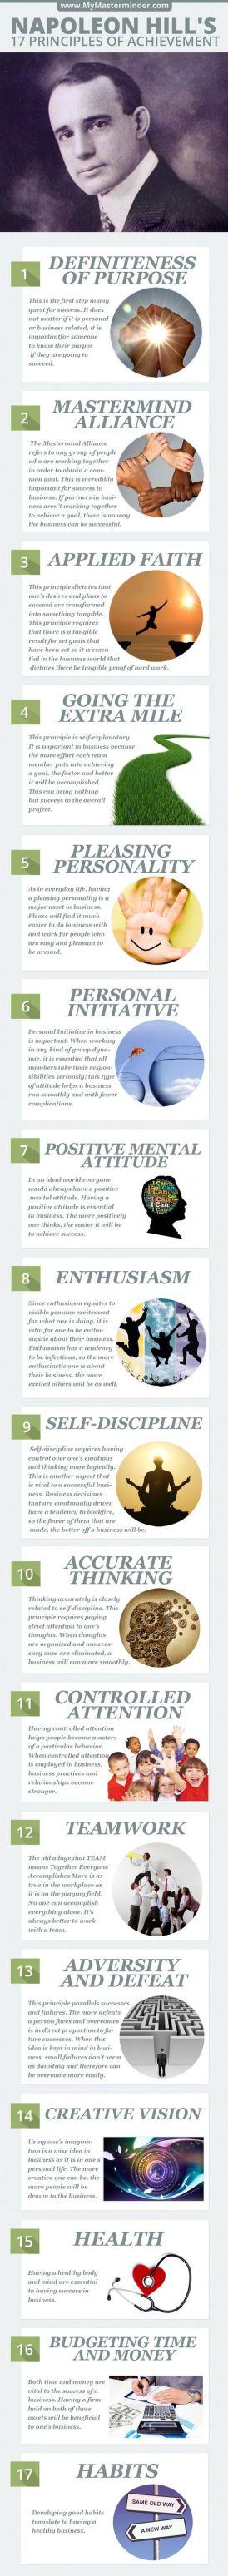 Napoleon Hill's 17 Principles of Personal Achievement: